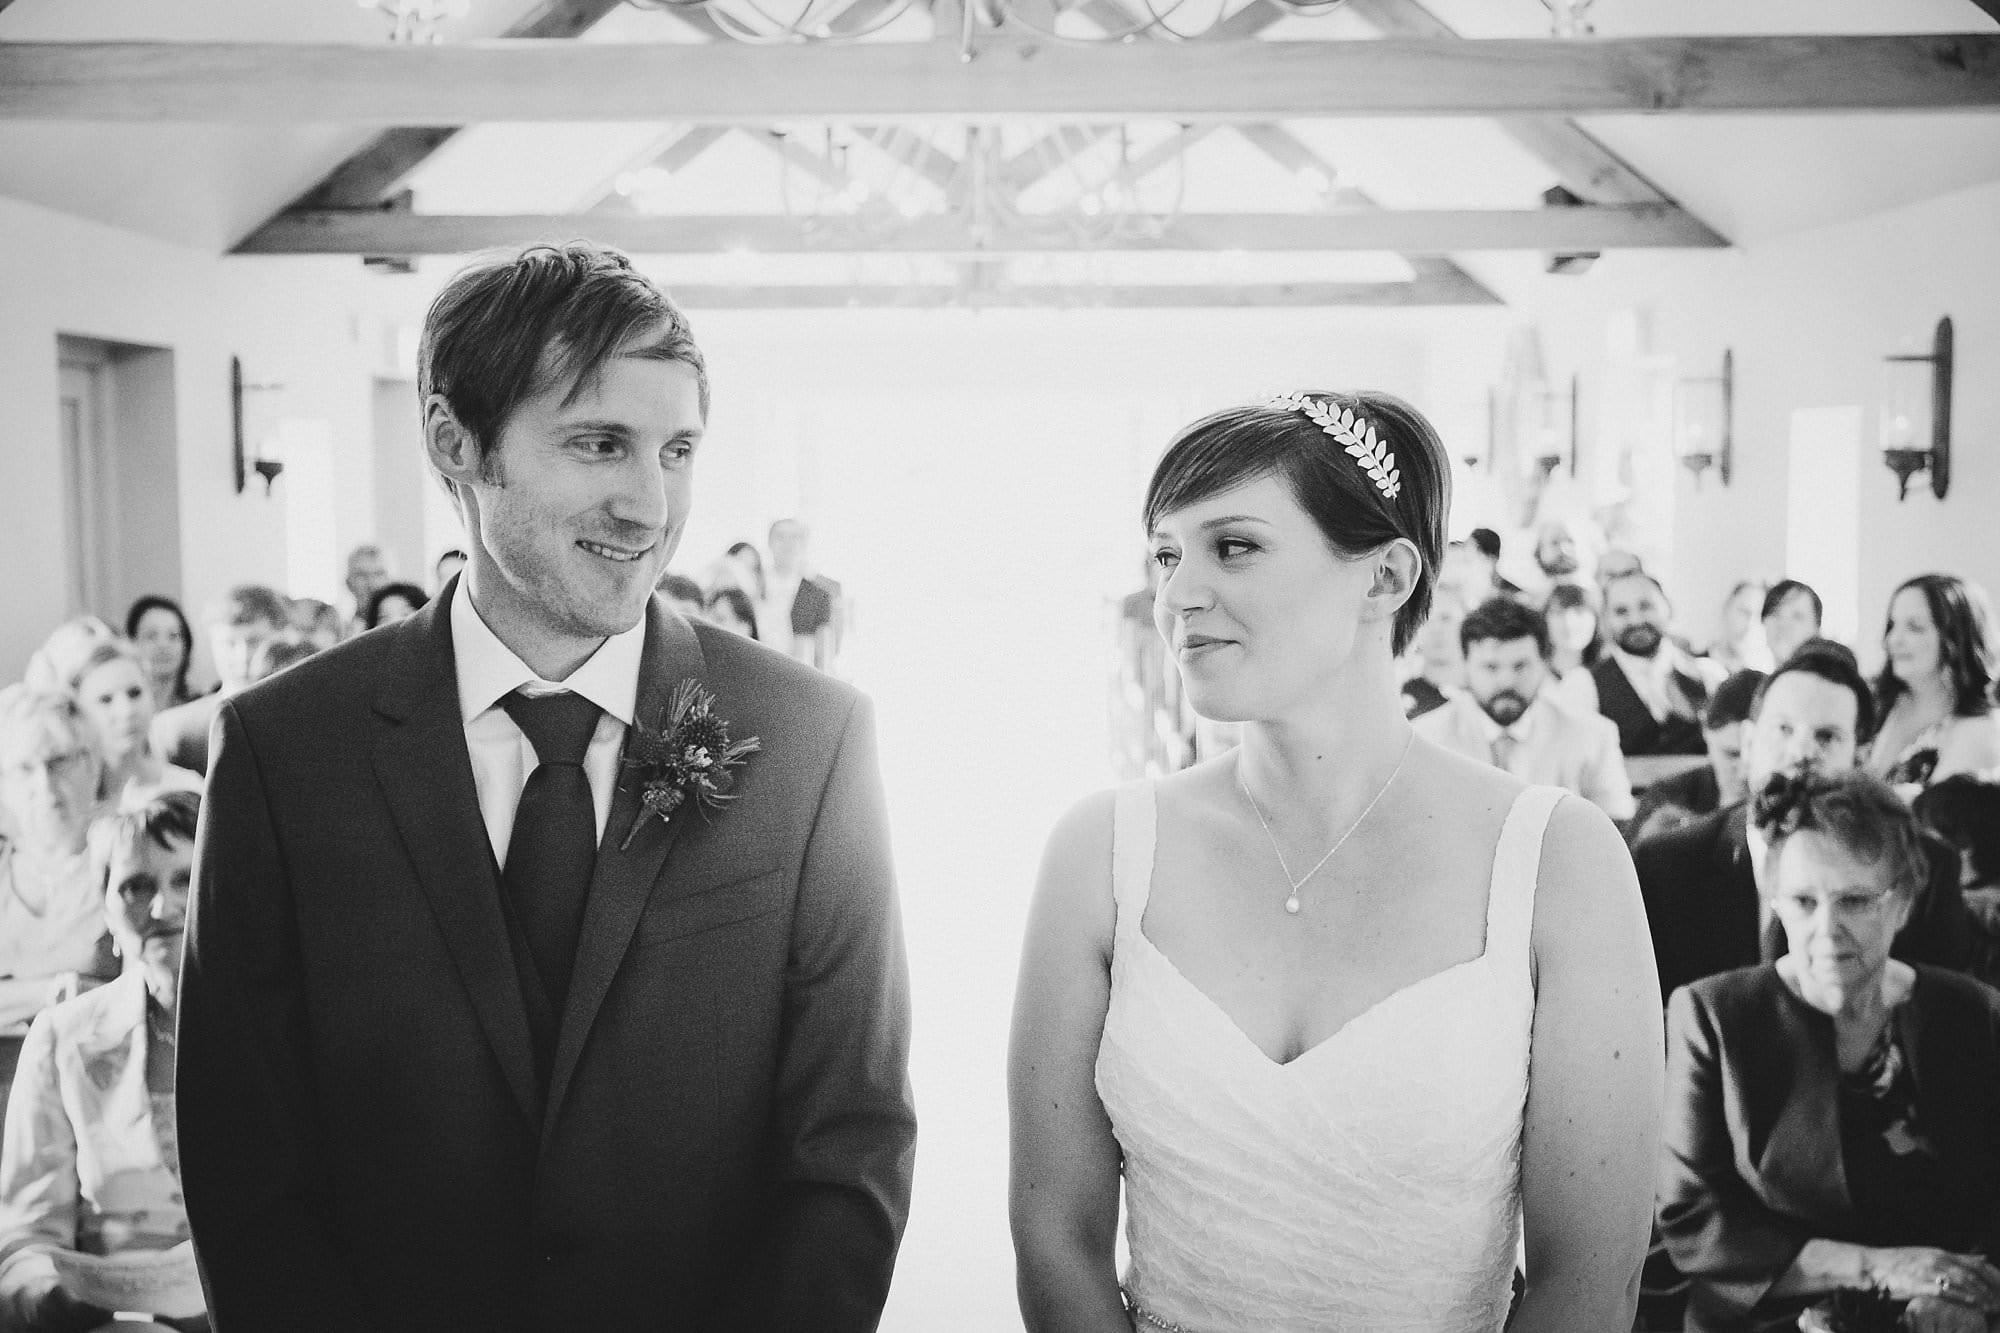 oaks farm wedding photographer cj 039 - Cat + Jake   Oaks Farm Wedding Photography